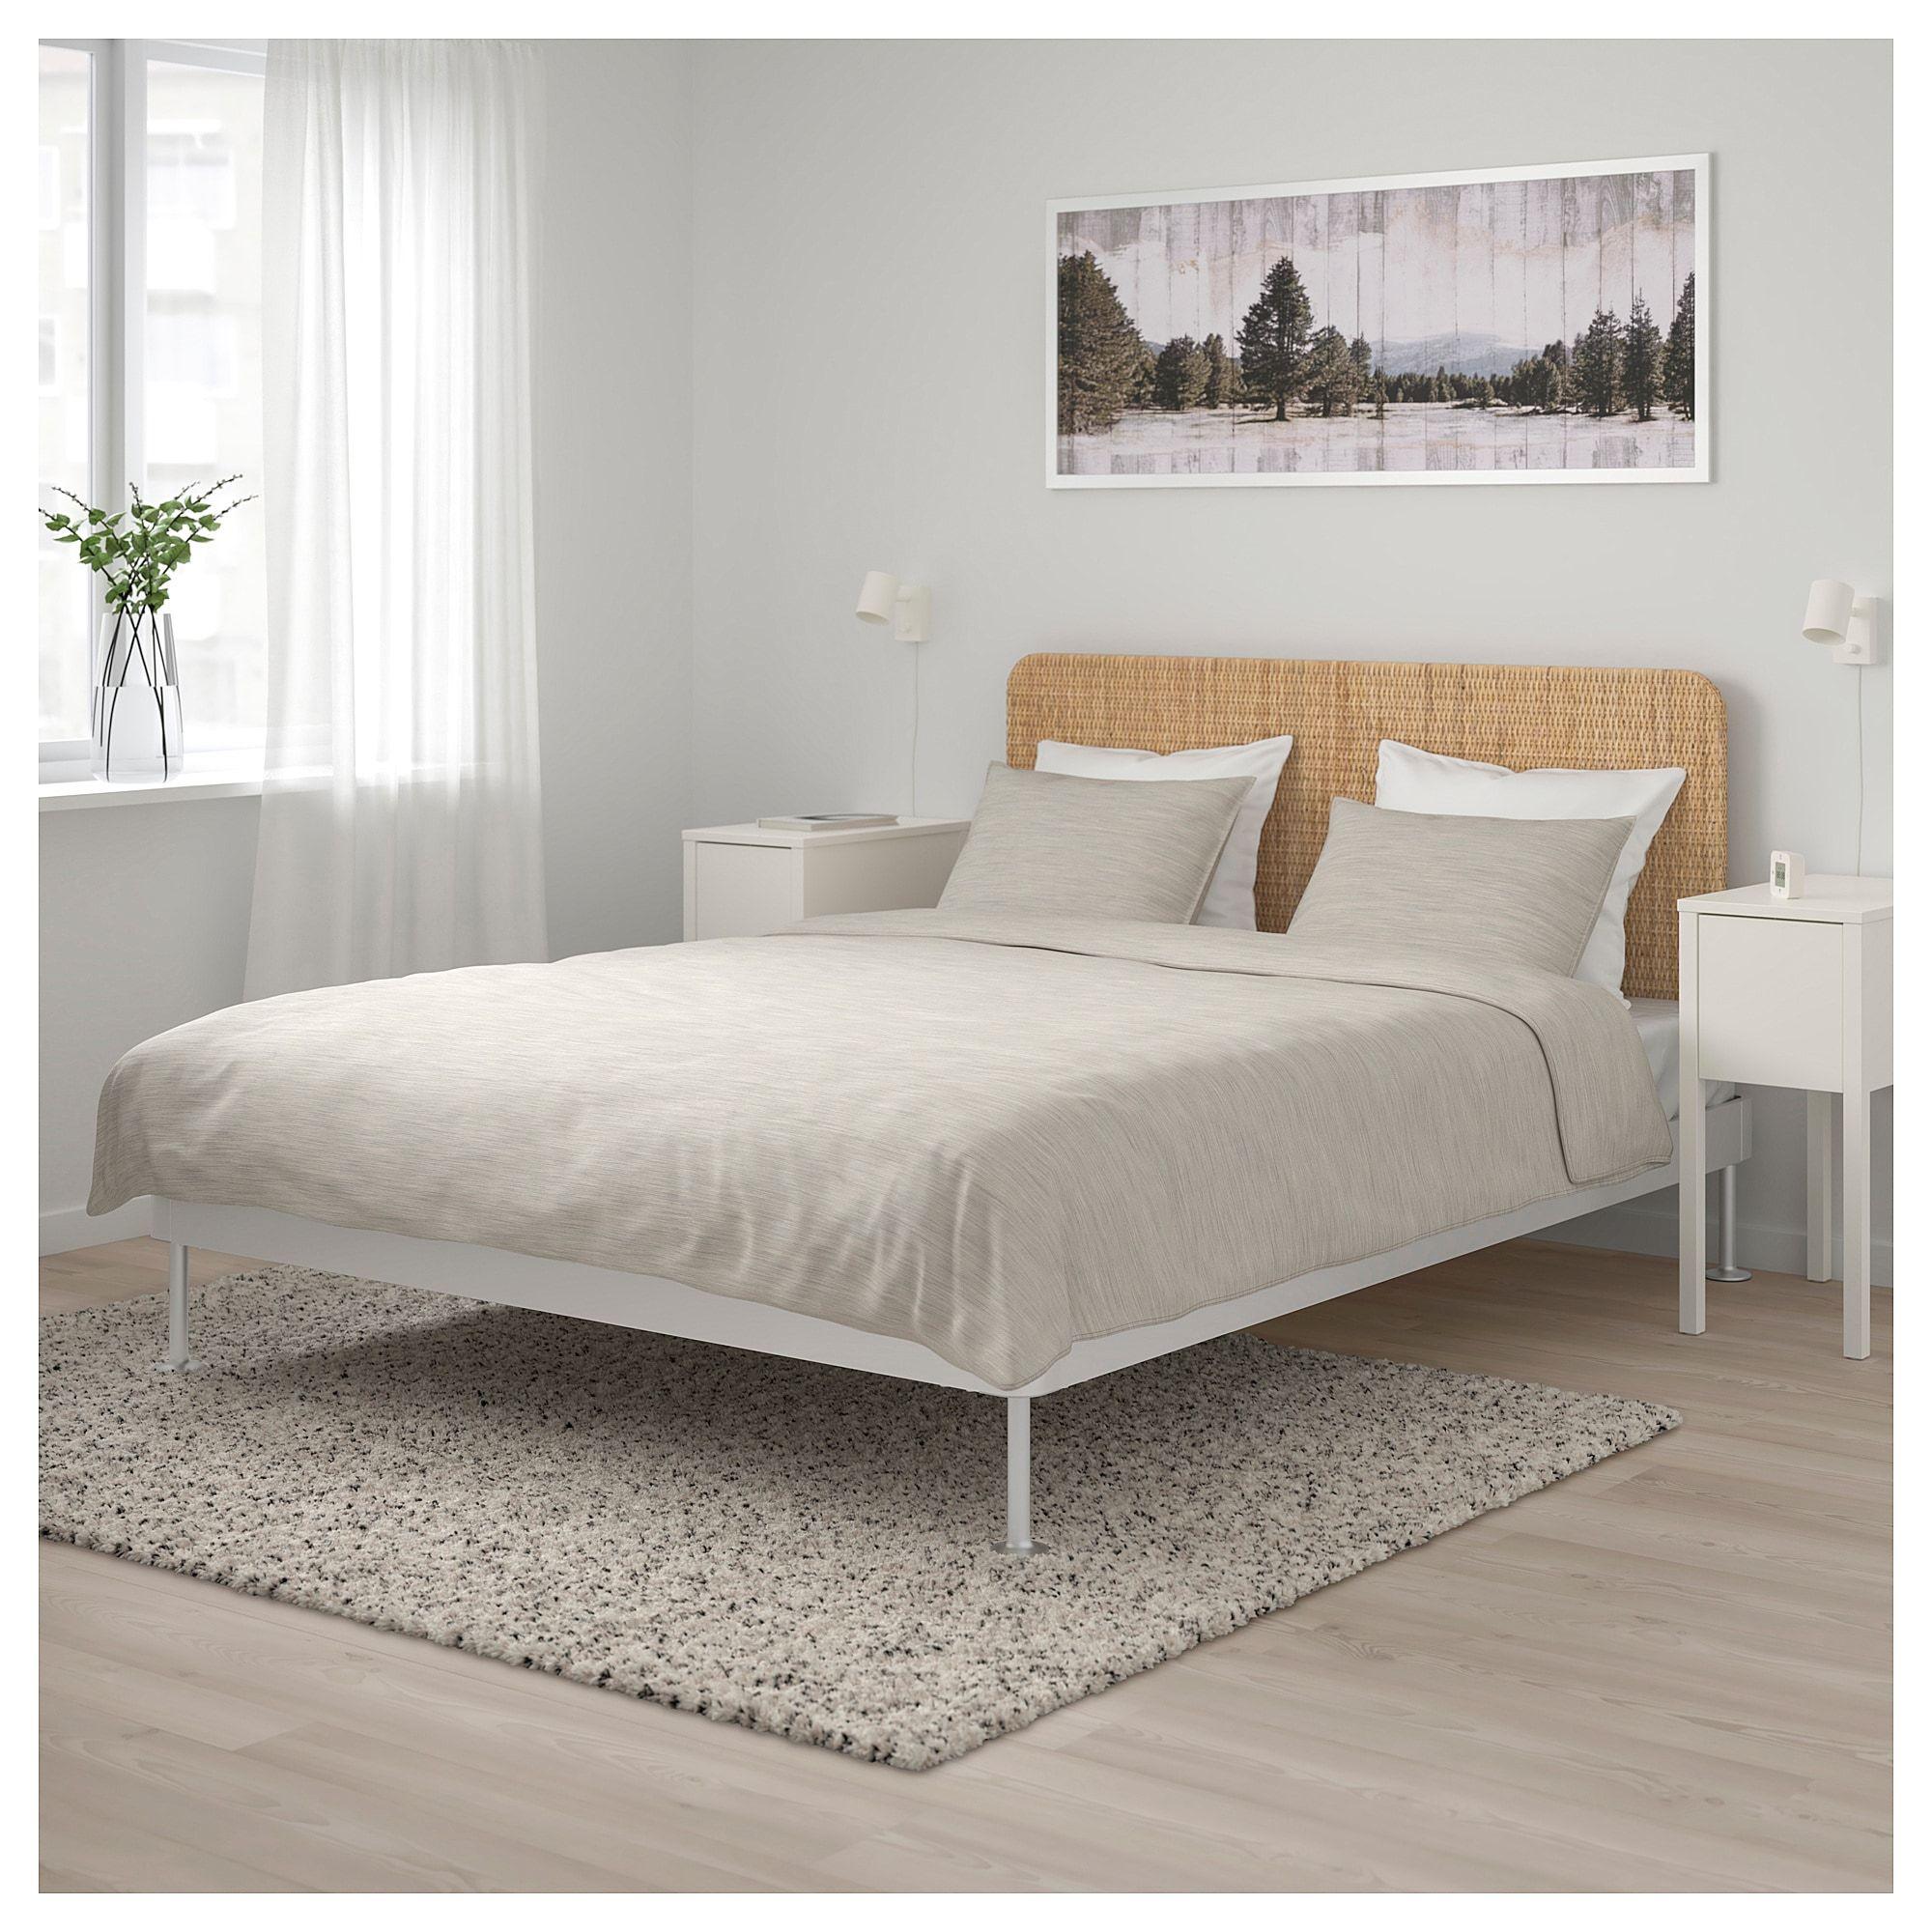 Delaktig Bed Frame With Headboard Aluminum Rattan Queen Bed